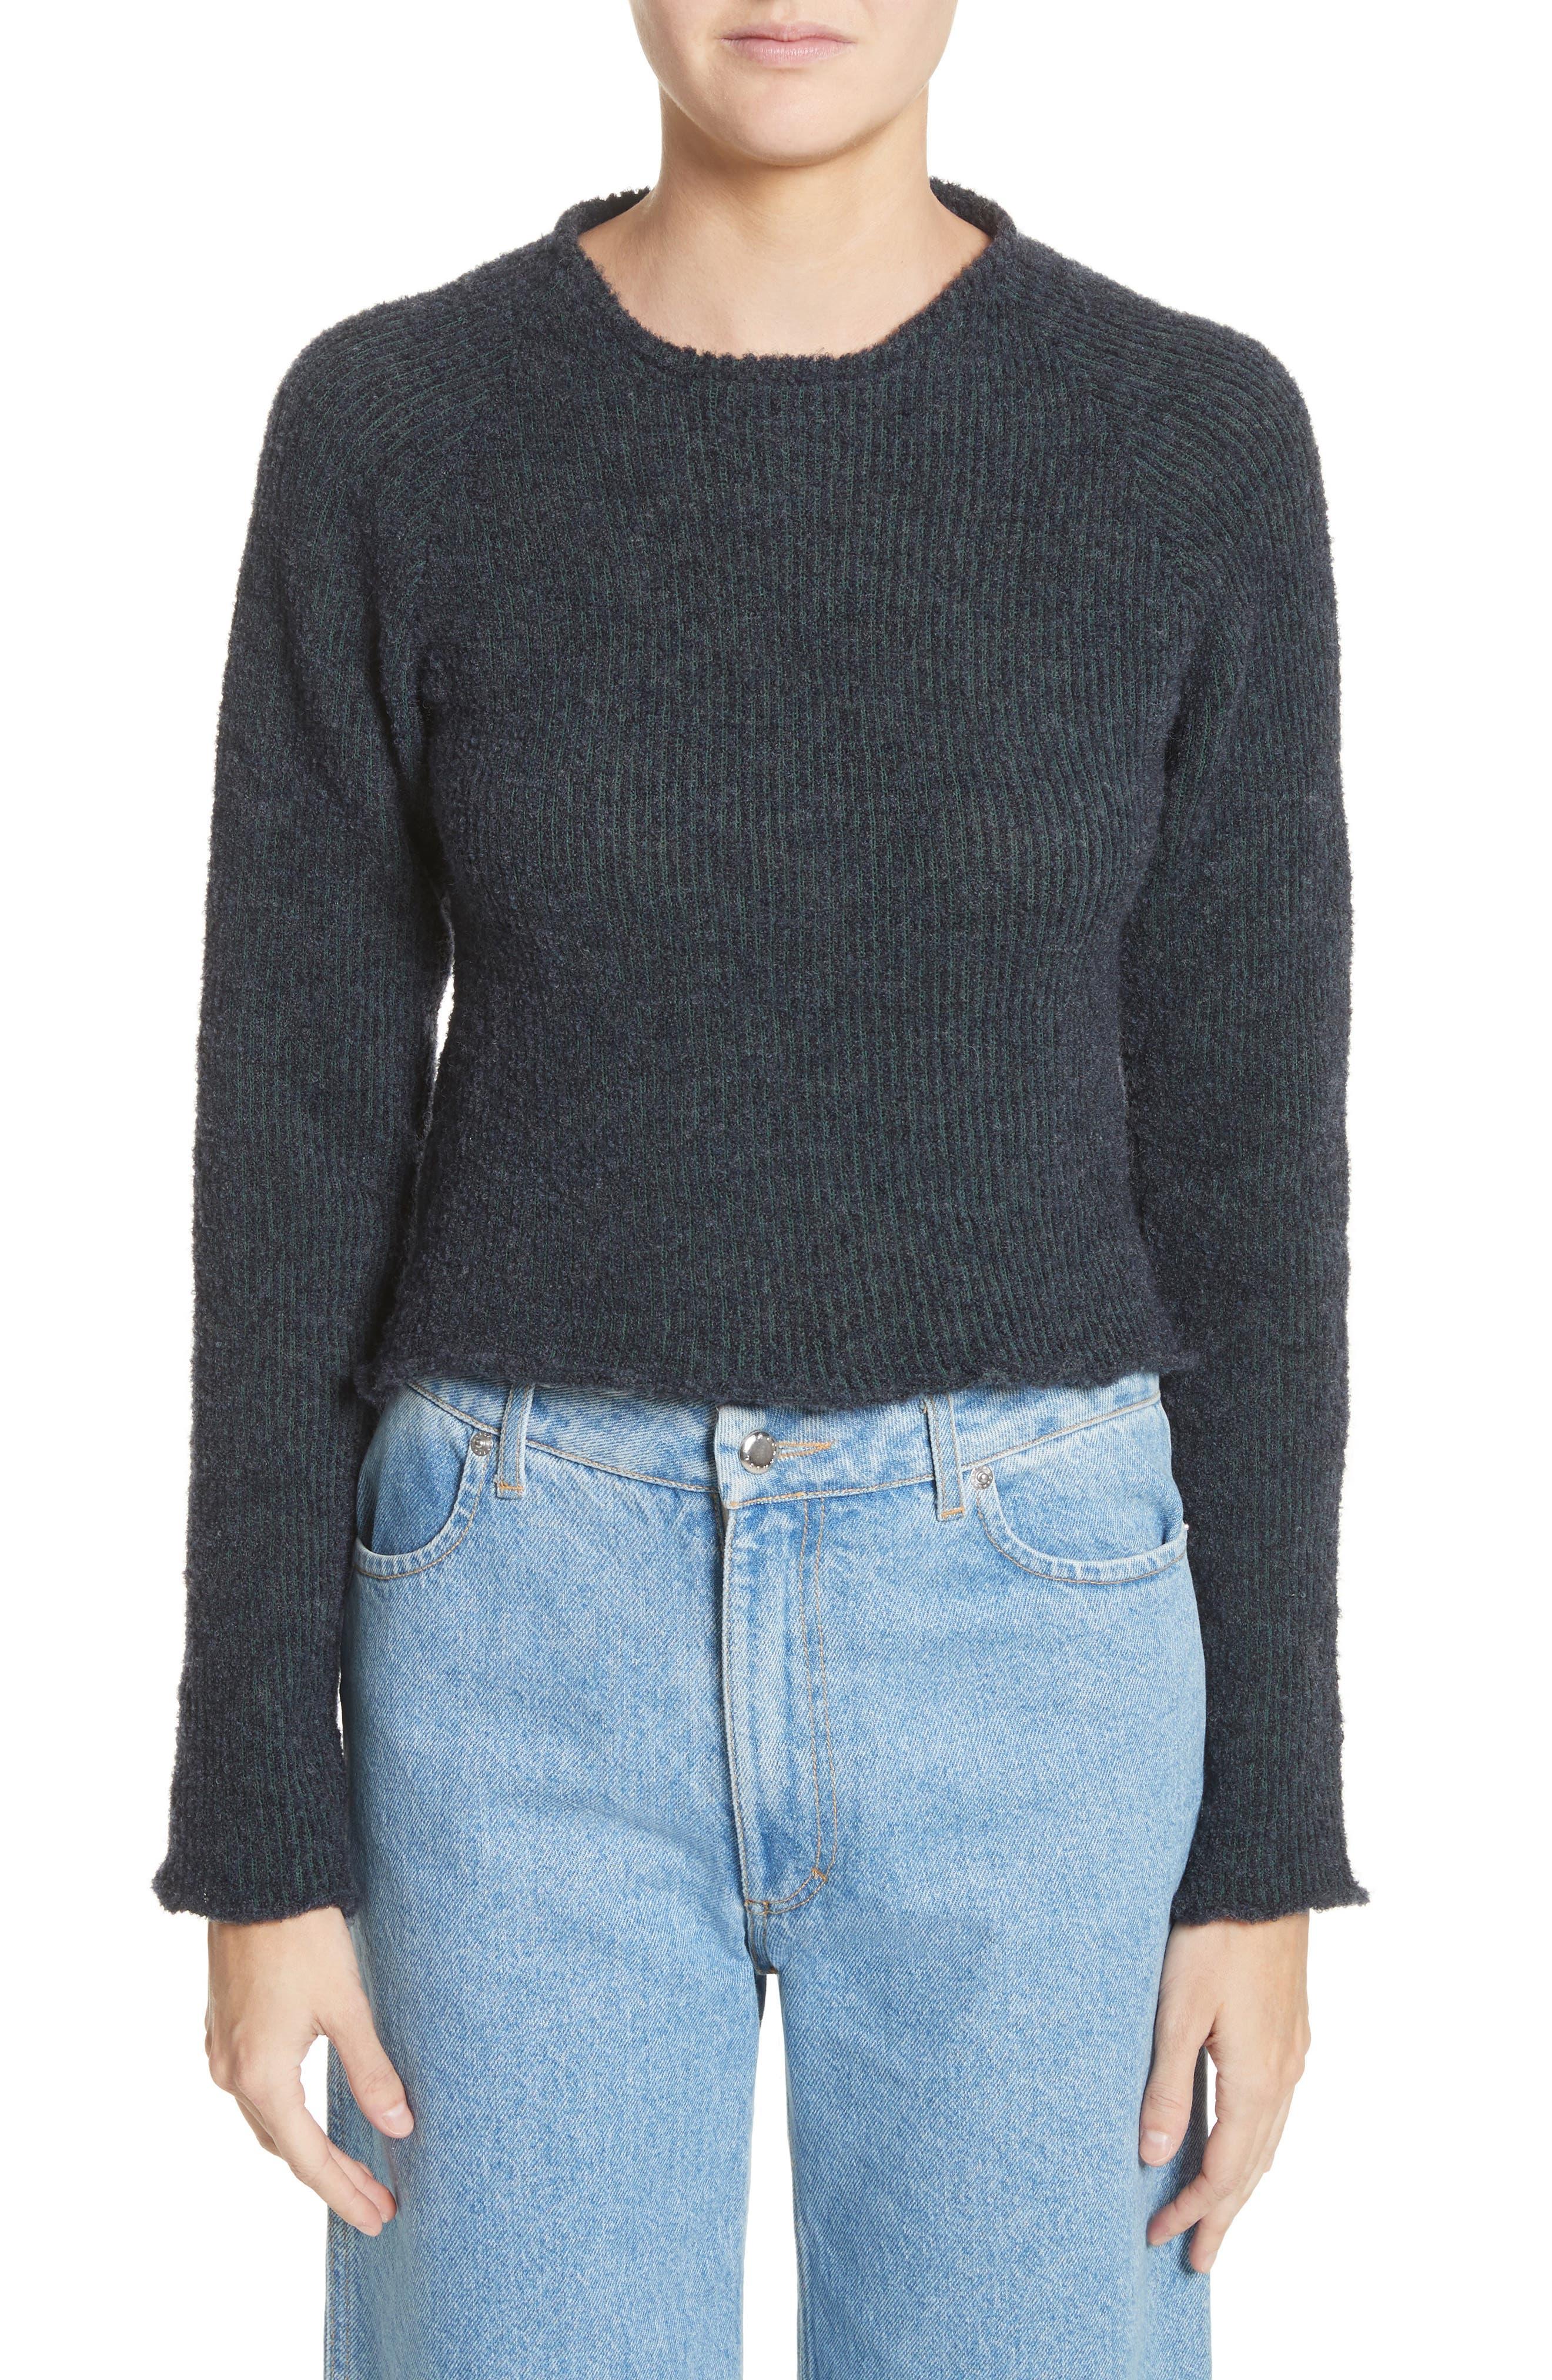 Raglan Pullover Sweater,                         Main,                         color, NAVY